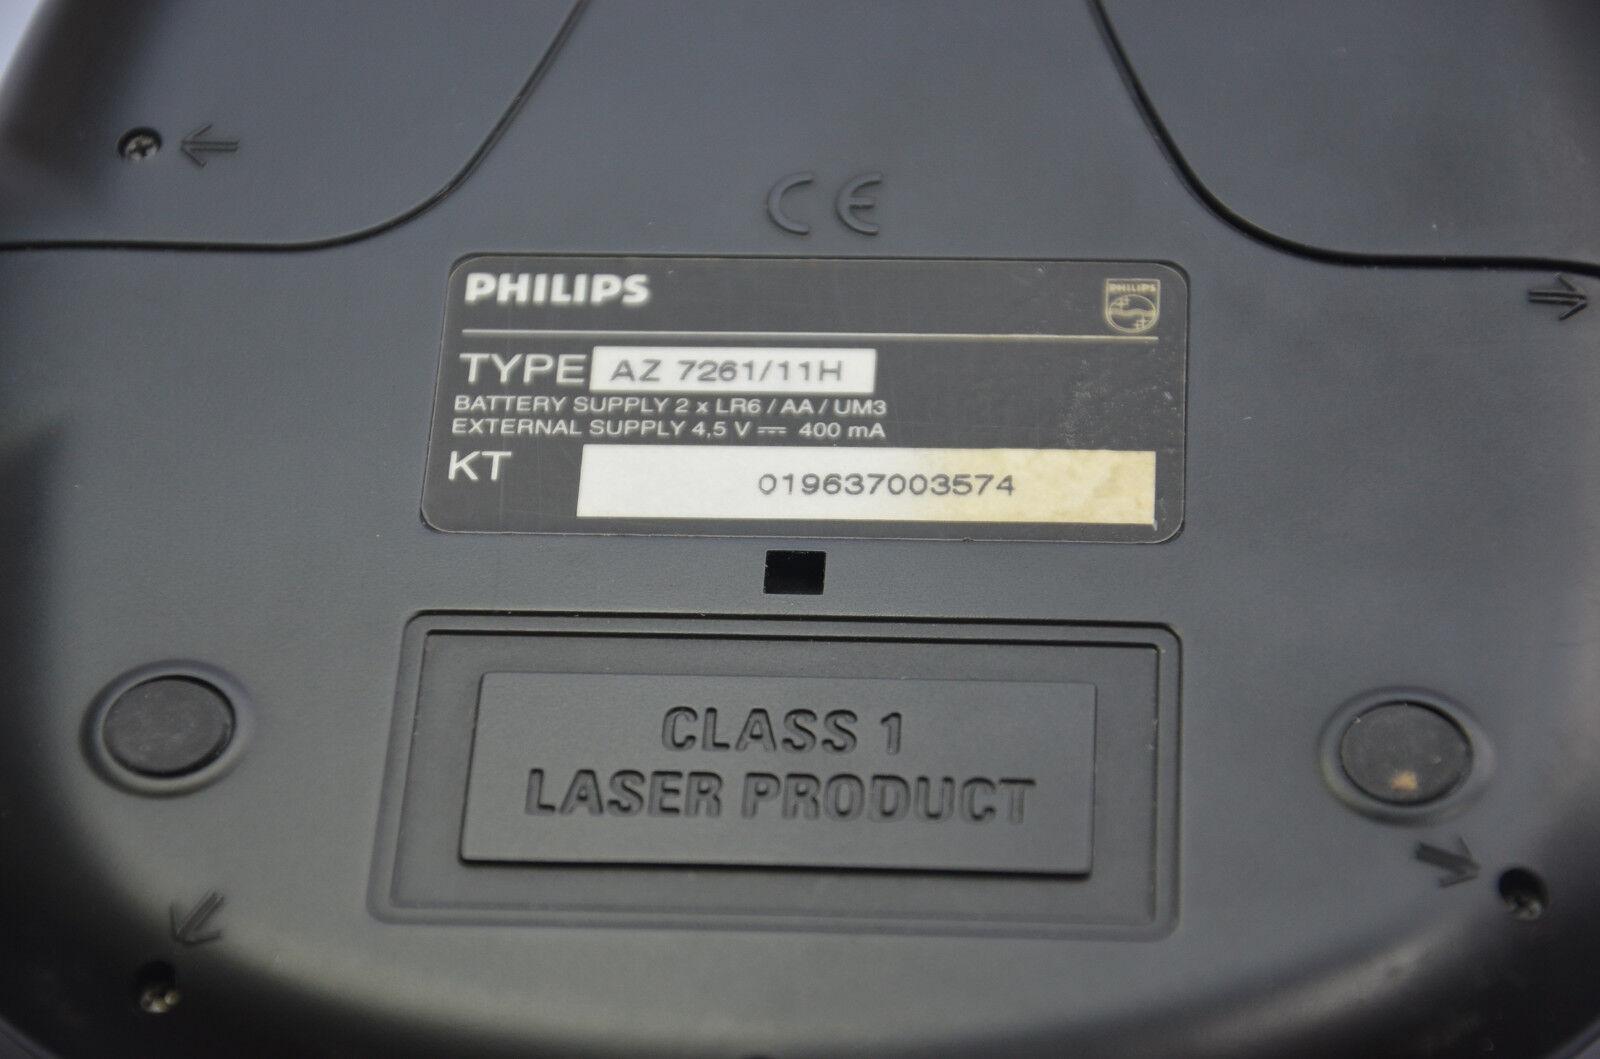 Philips Portable CD Player Az7261 DBB Walkman Discman Boxed 4u2fix | eBay